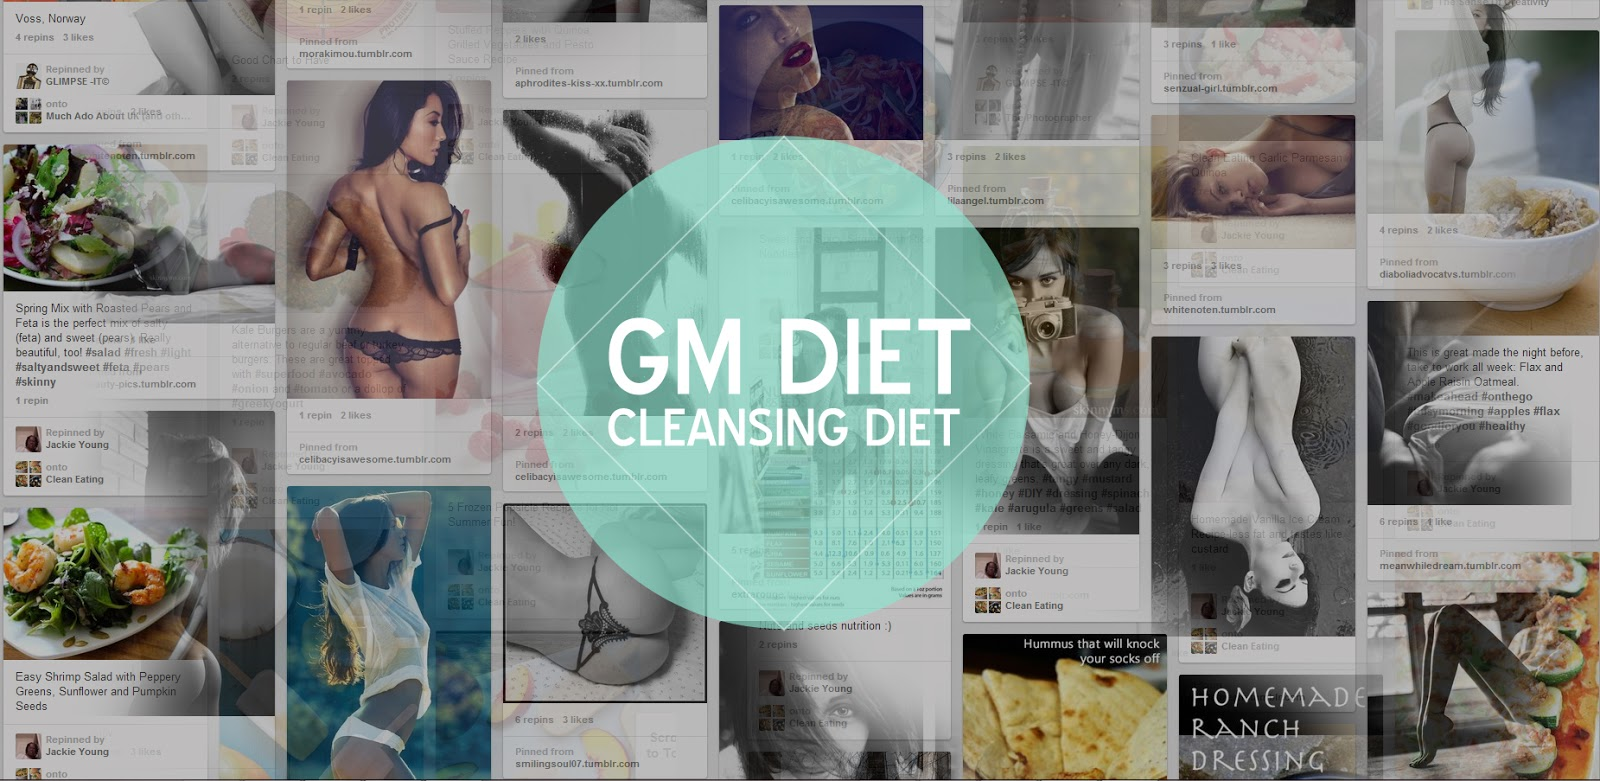 The GM Diet